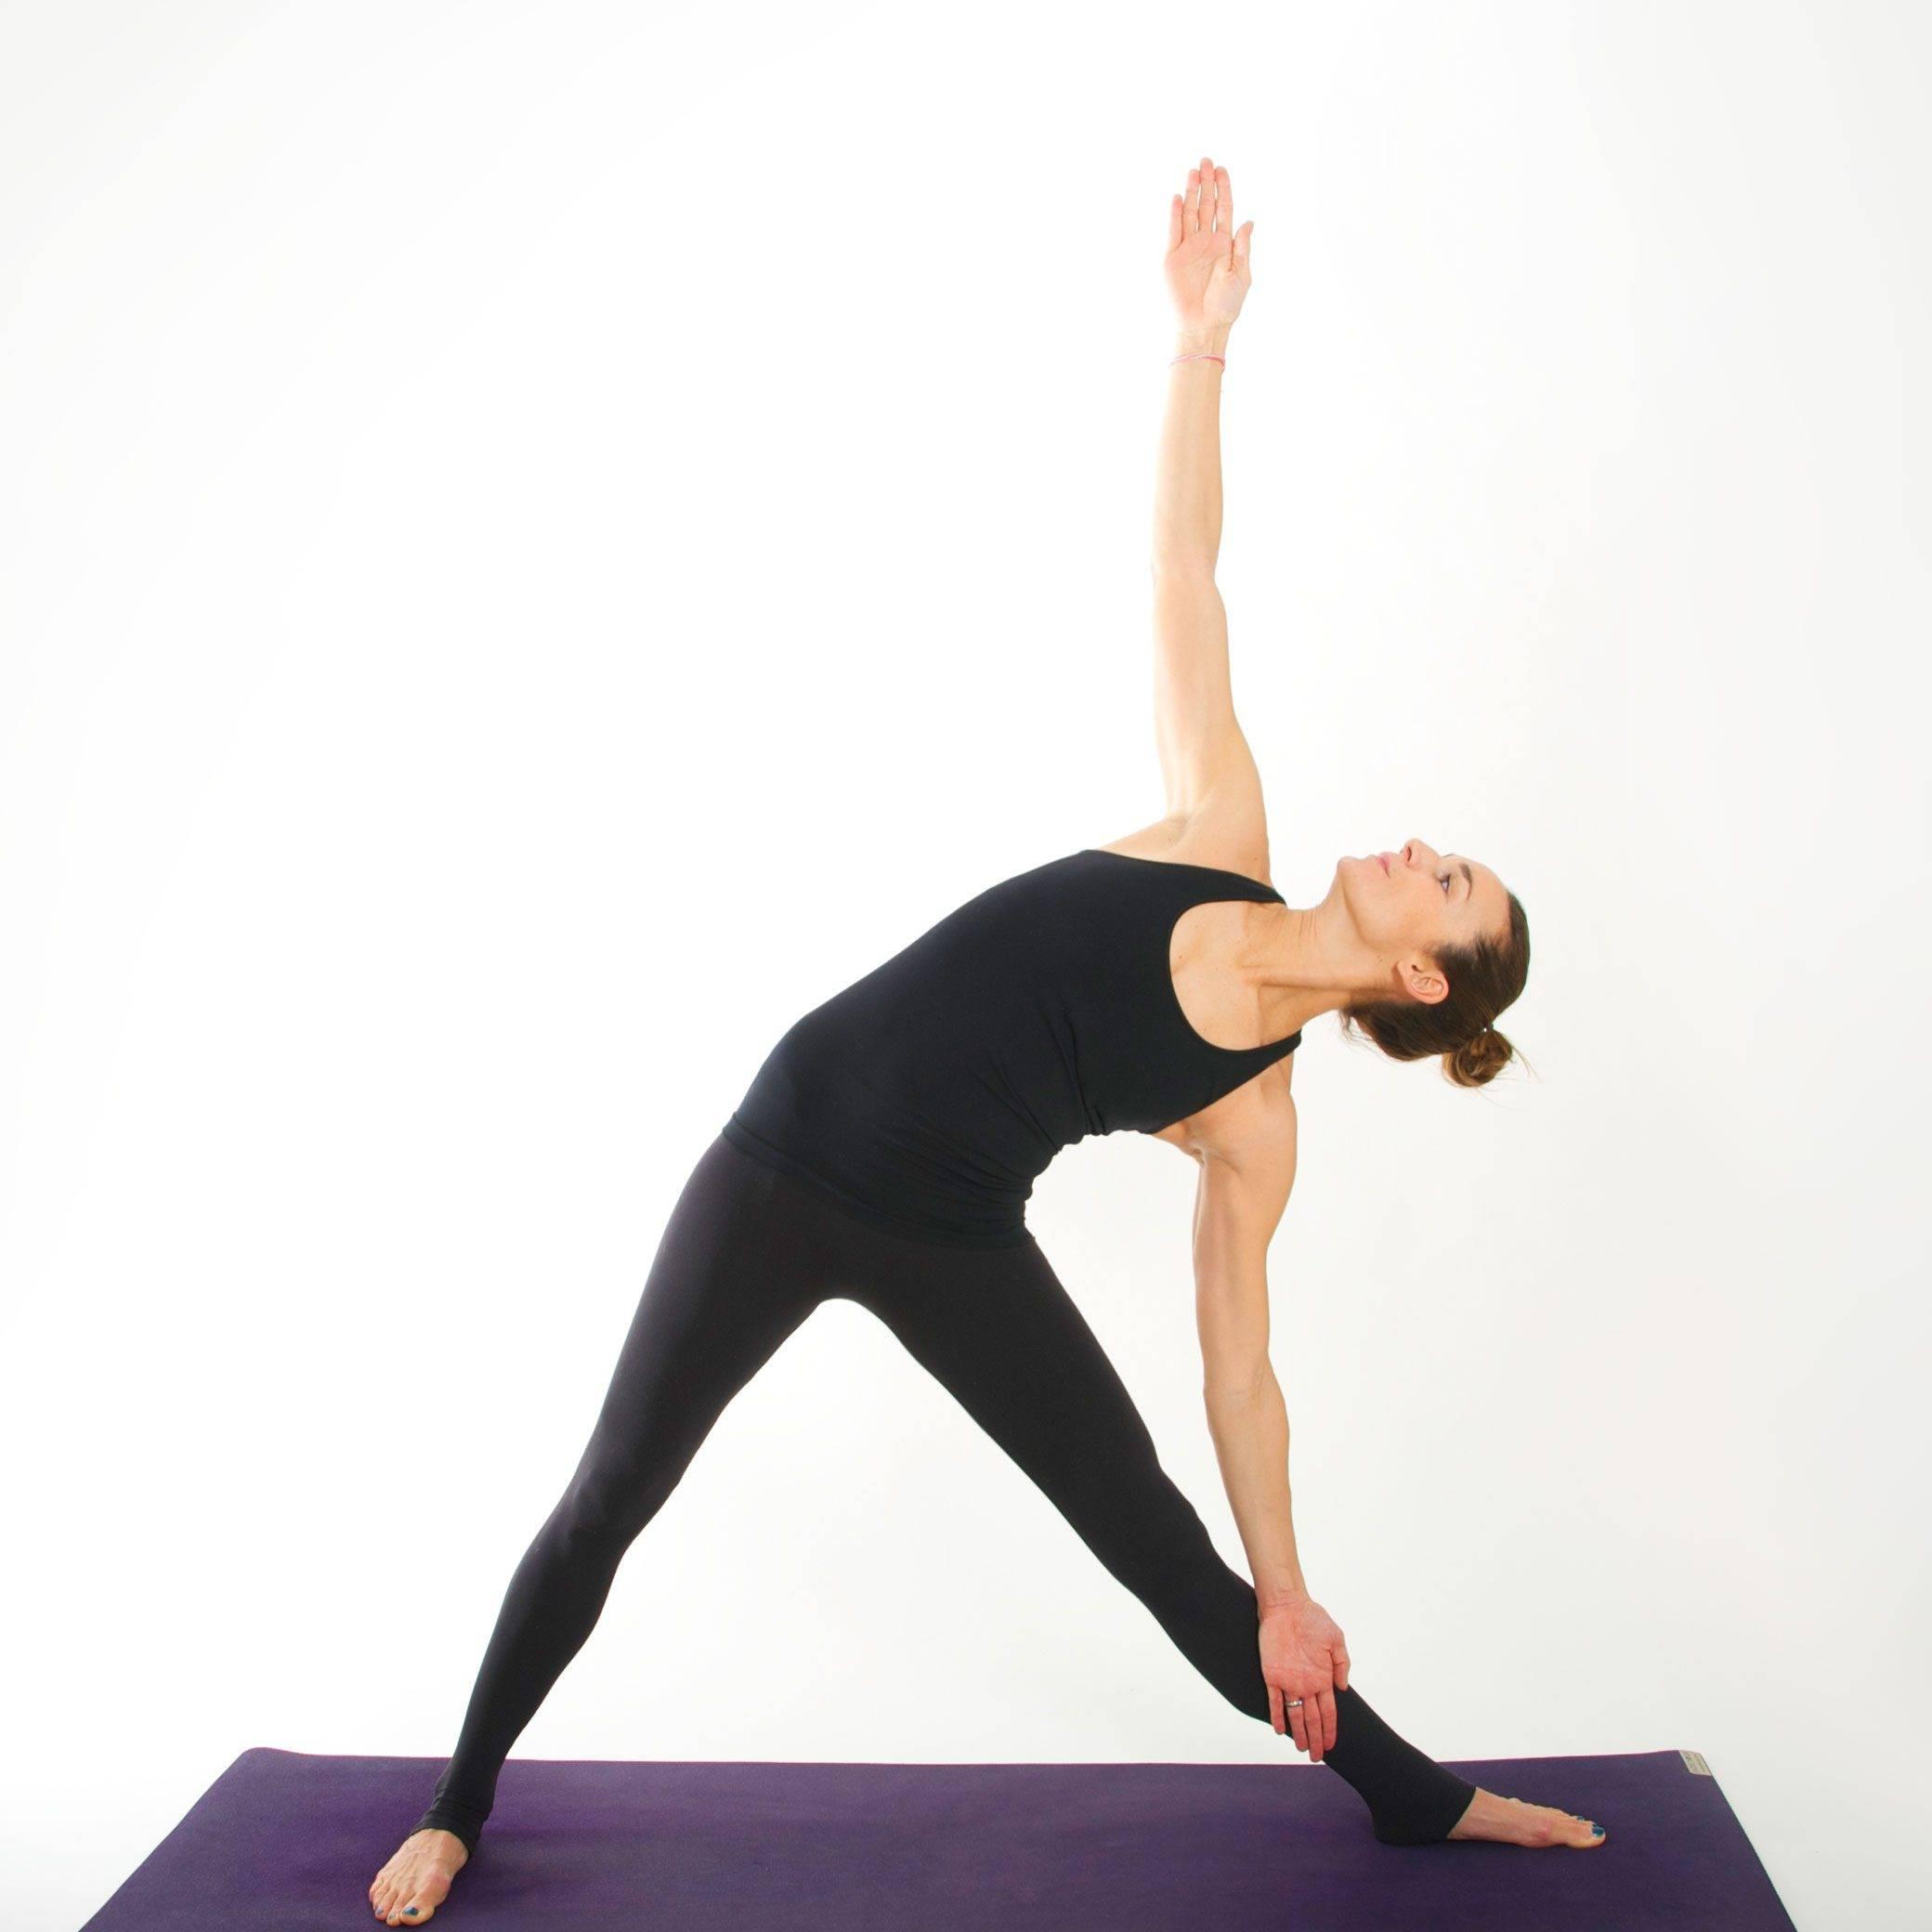 Уттхита паршваконасана: техника выполнения позы в йоге с фото и видео